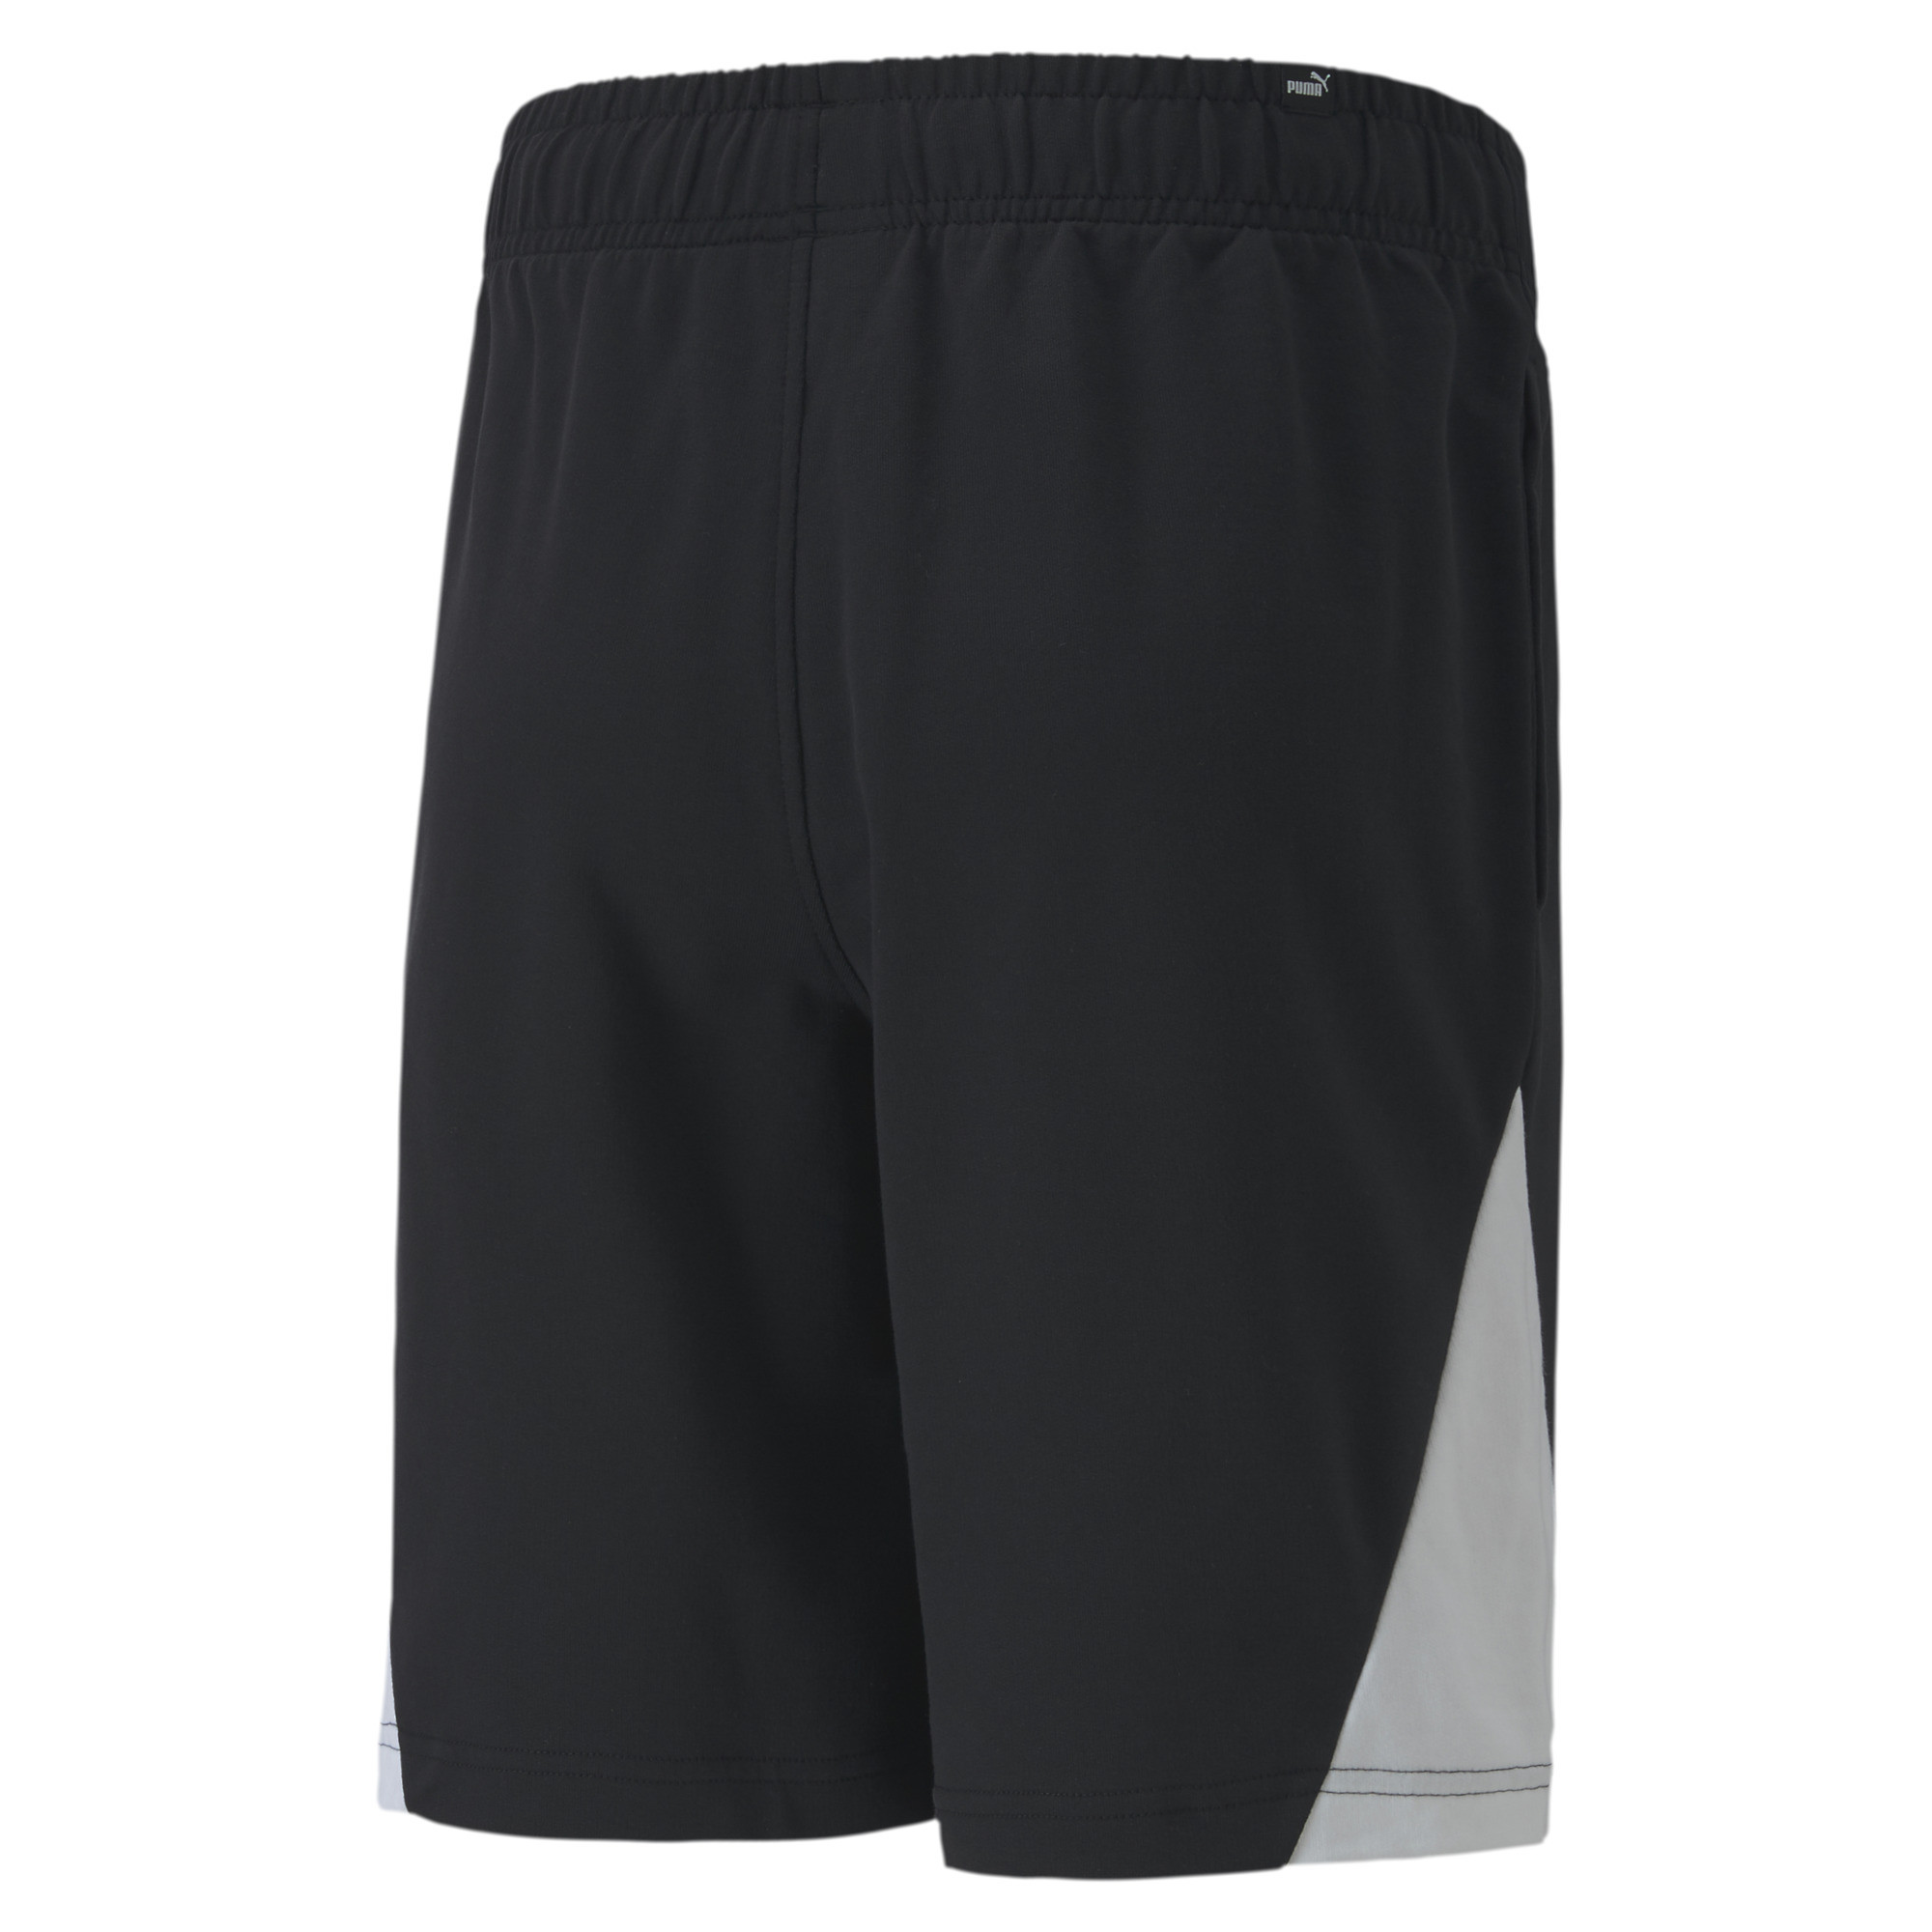 PUMA-Summer-Print-Men-039-s-Shorts-Men-Knitted-Shorts-Basics thumbnail 8